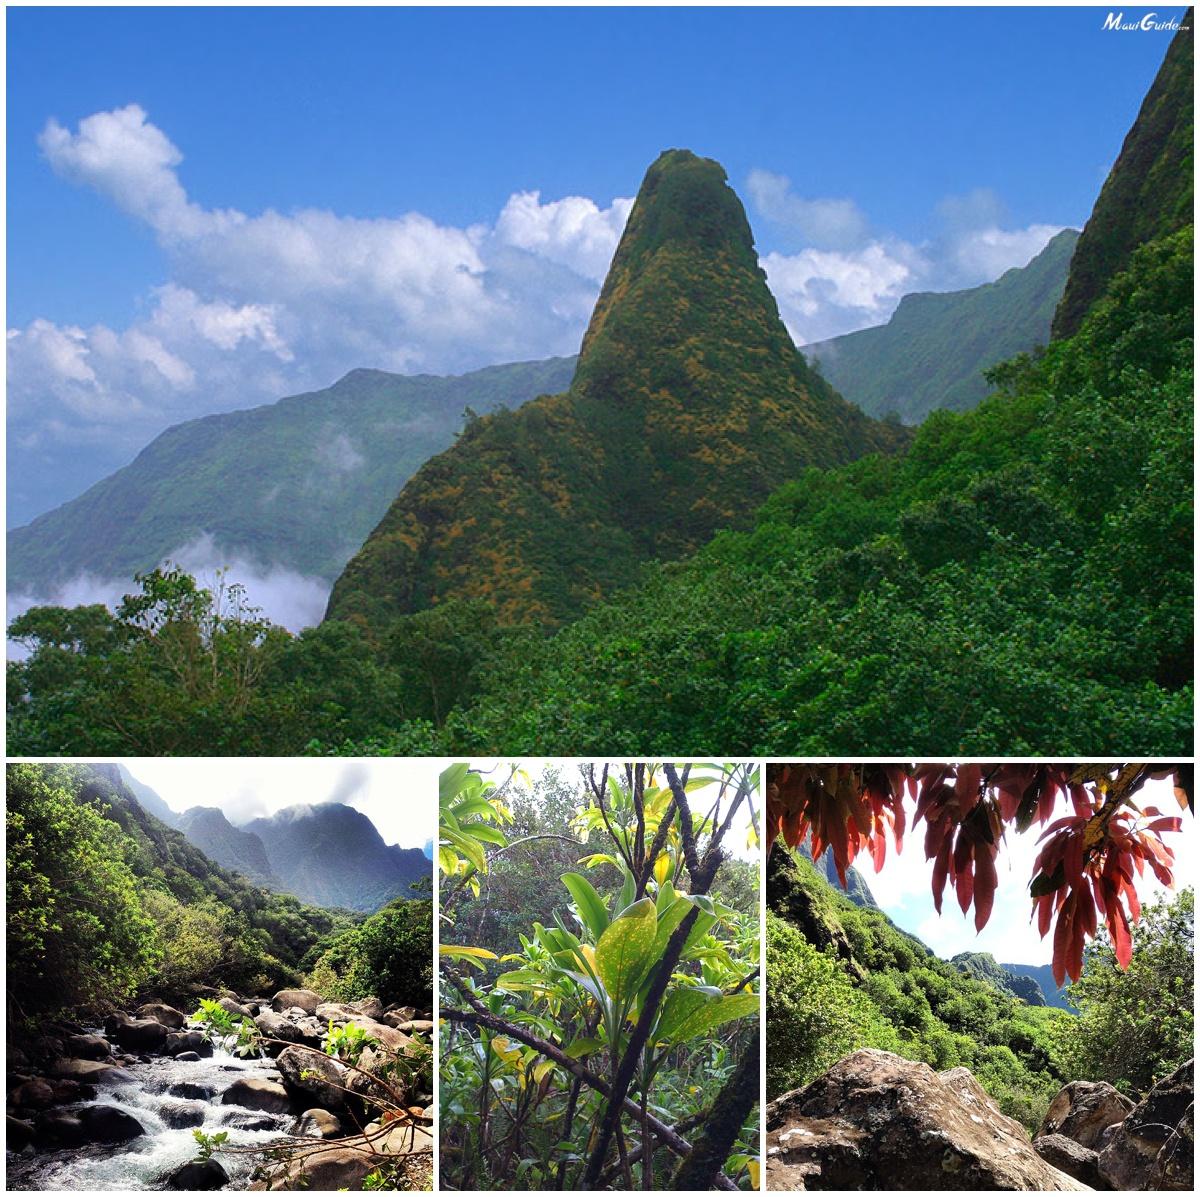 Wailuku Map | Photos, Video, Local Tips Wailuku Maui, Hawaii Wailuku